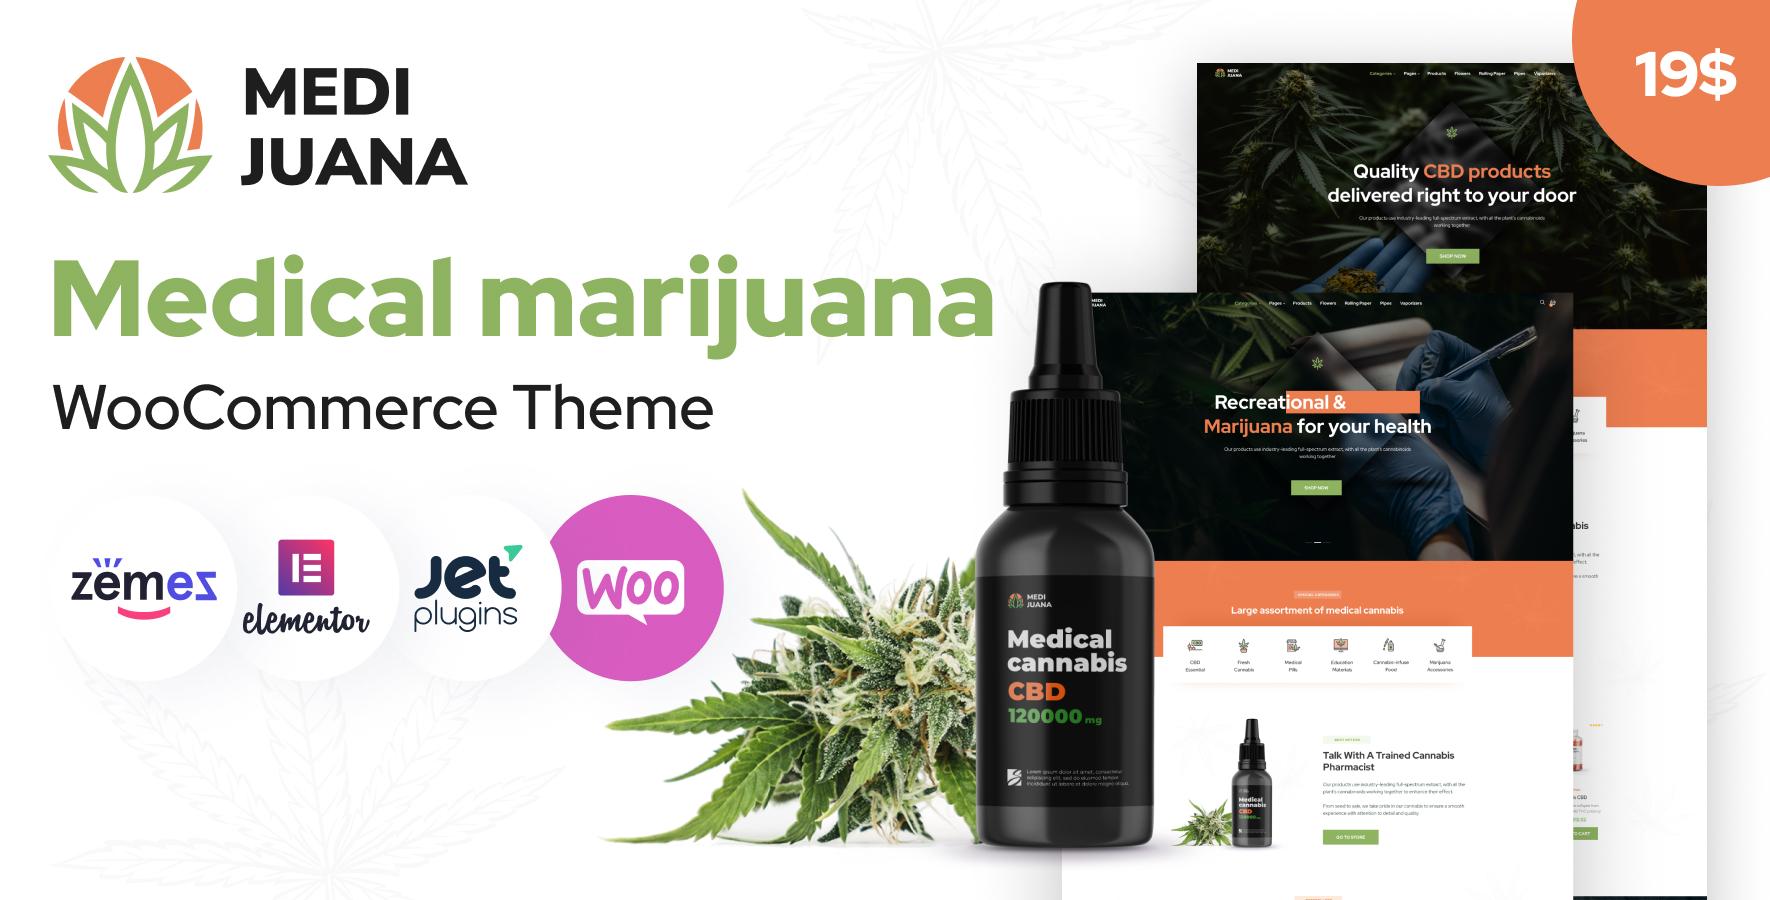 Medijuana Medical Cannabis WordPress Theme